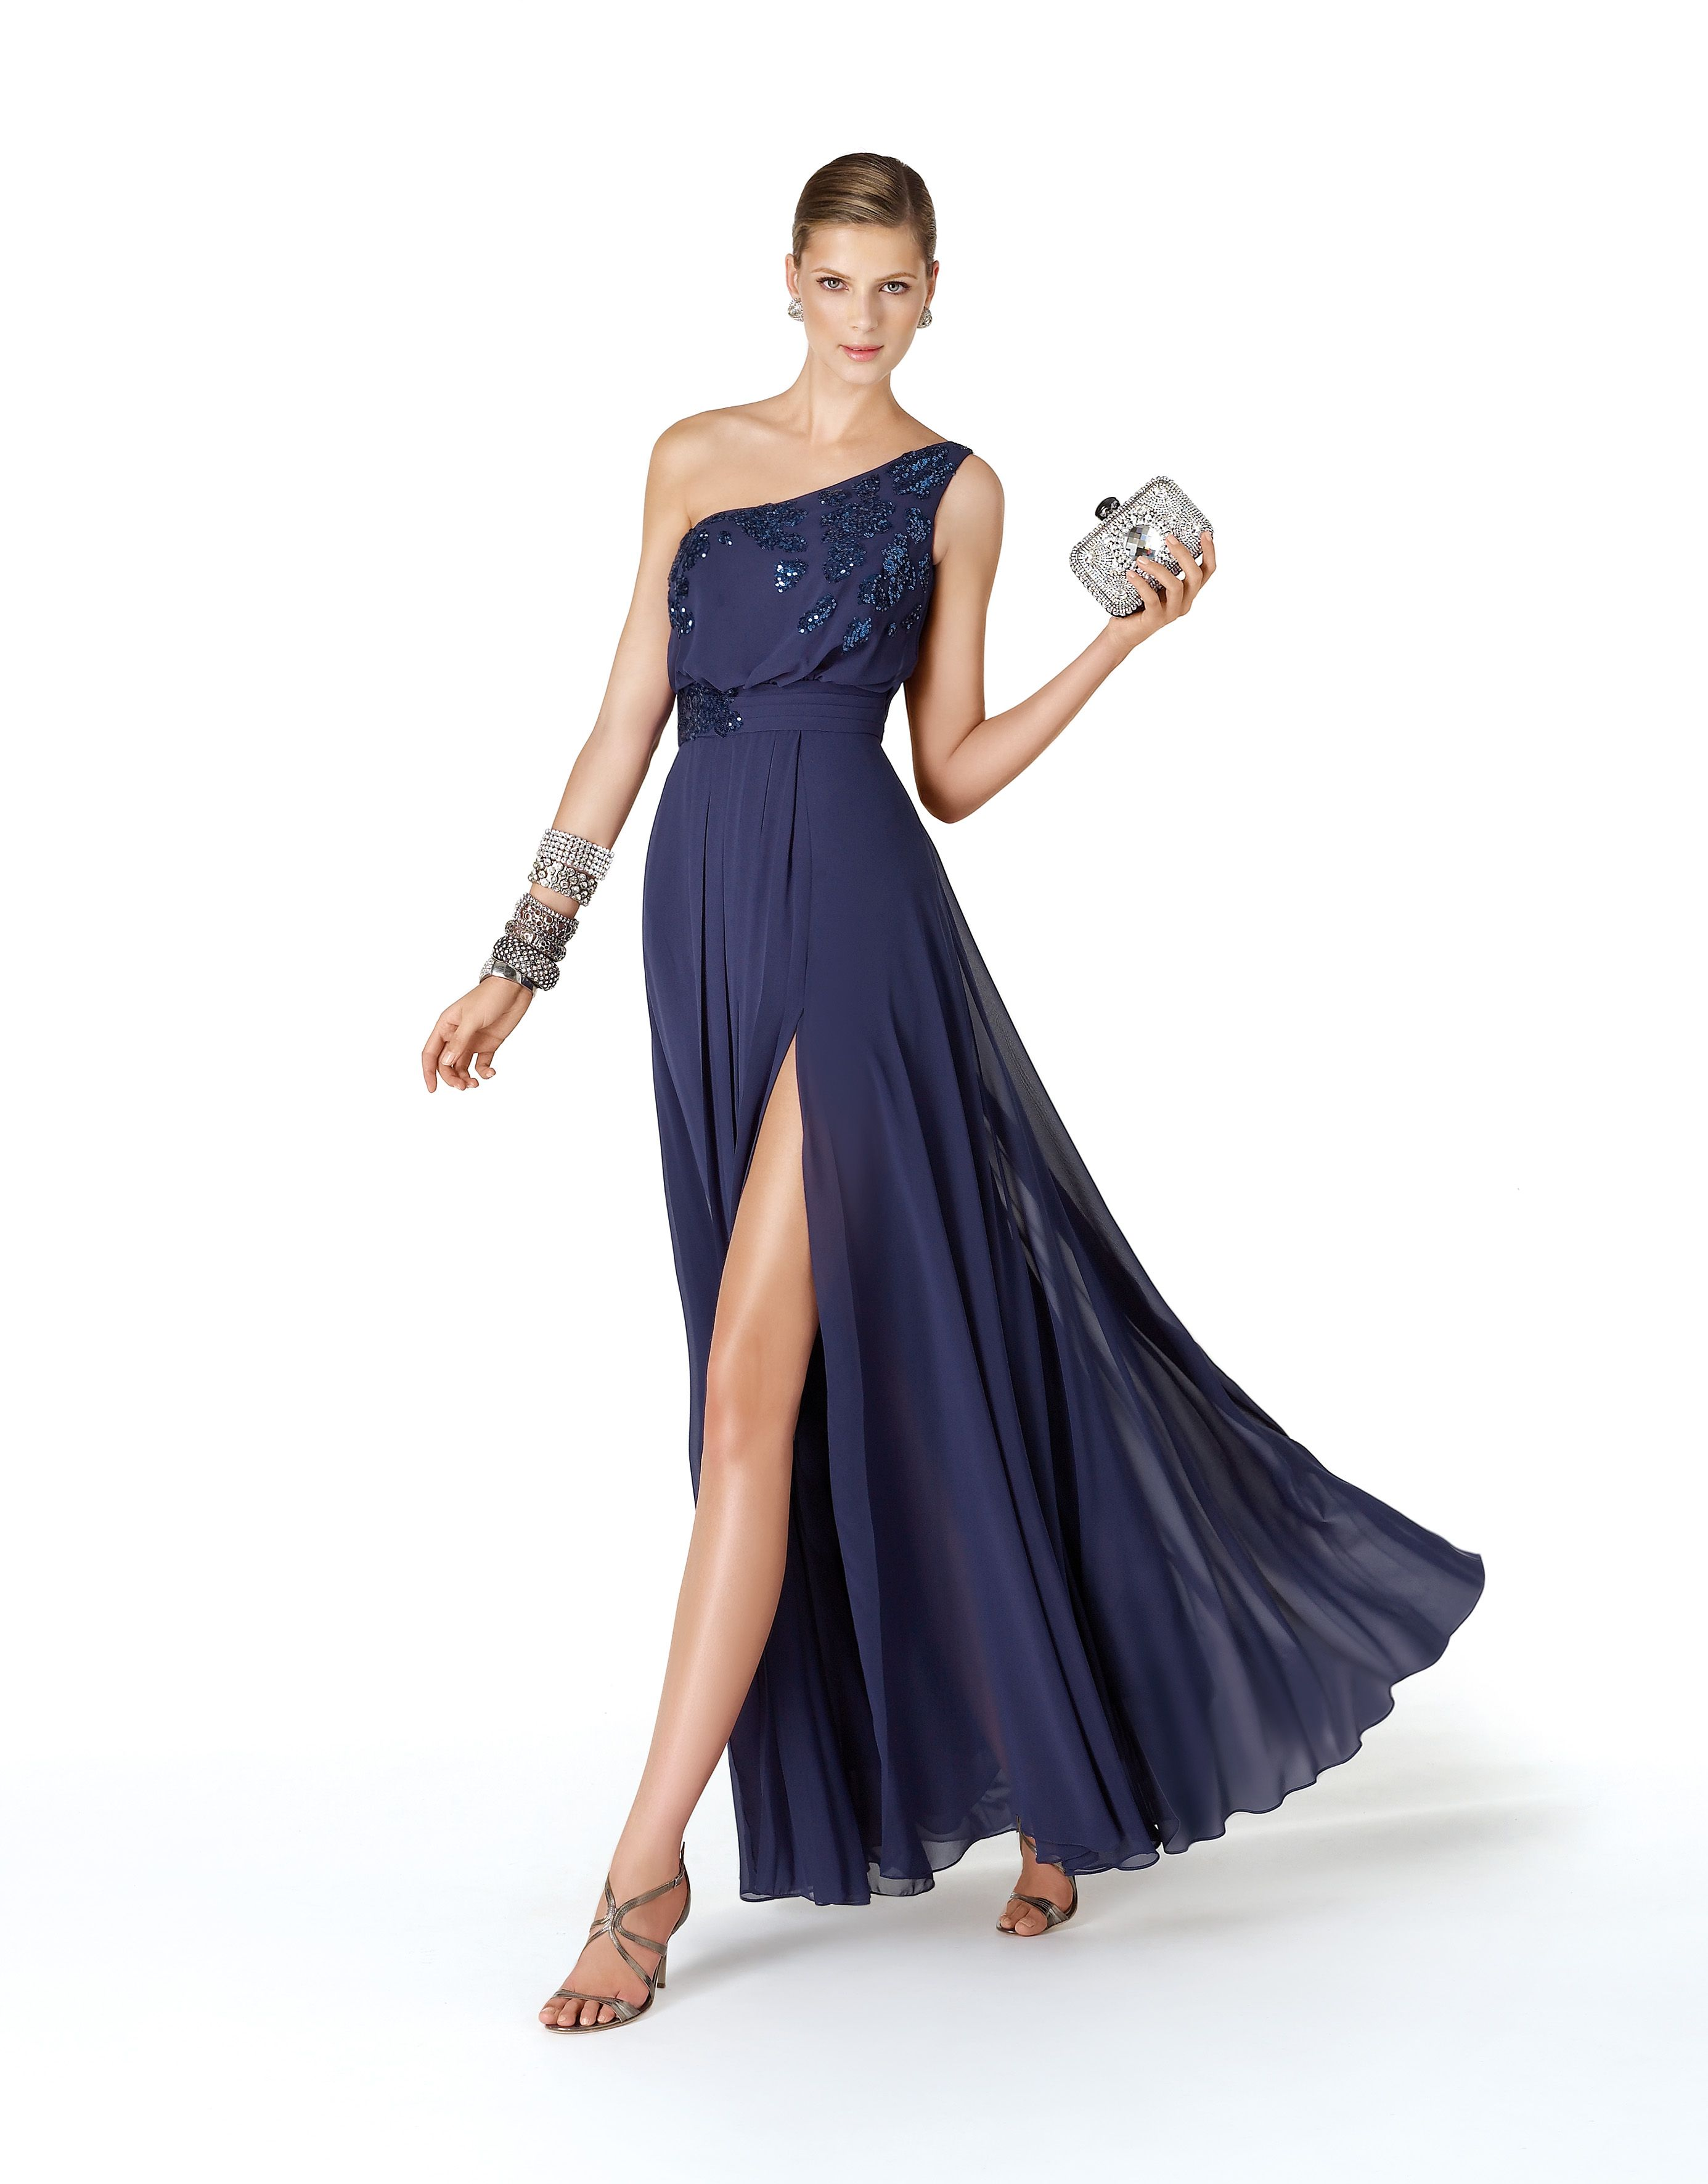 Vestido cocktail azul marino